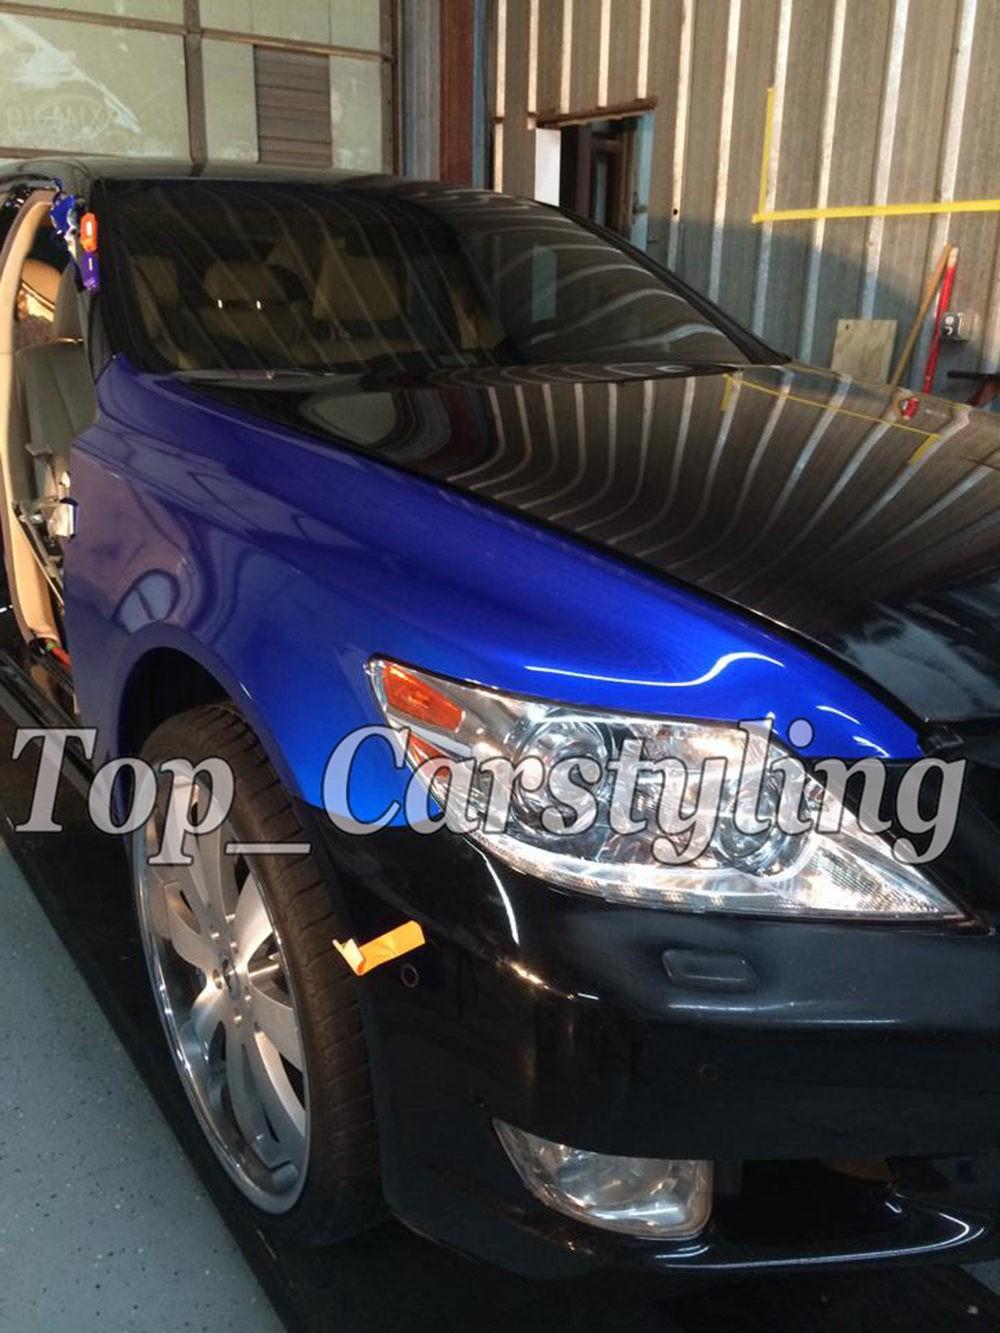 candy glossy blue metallic deep blue Shiny Car wrapping film (2)